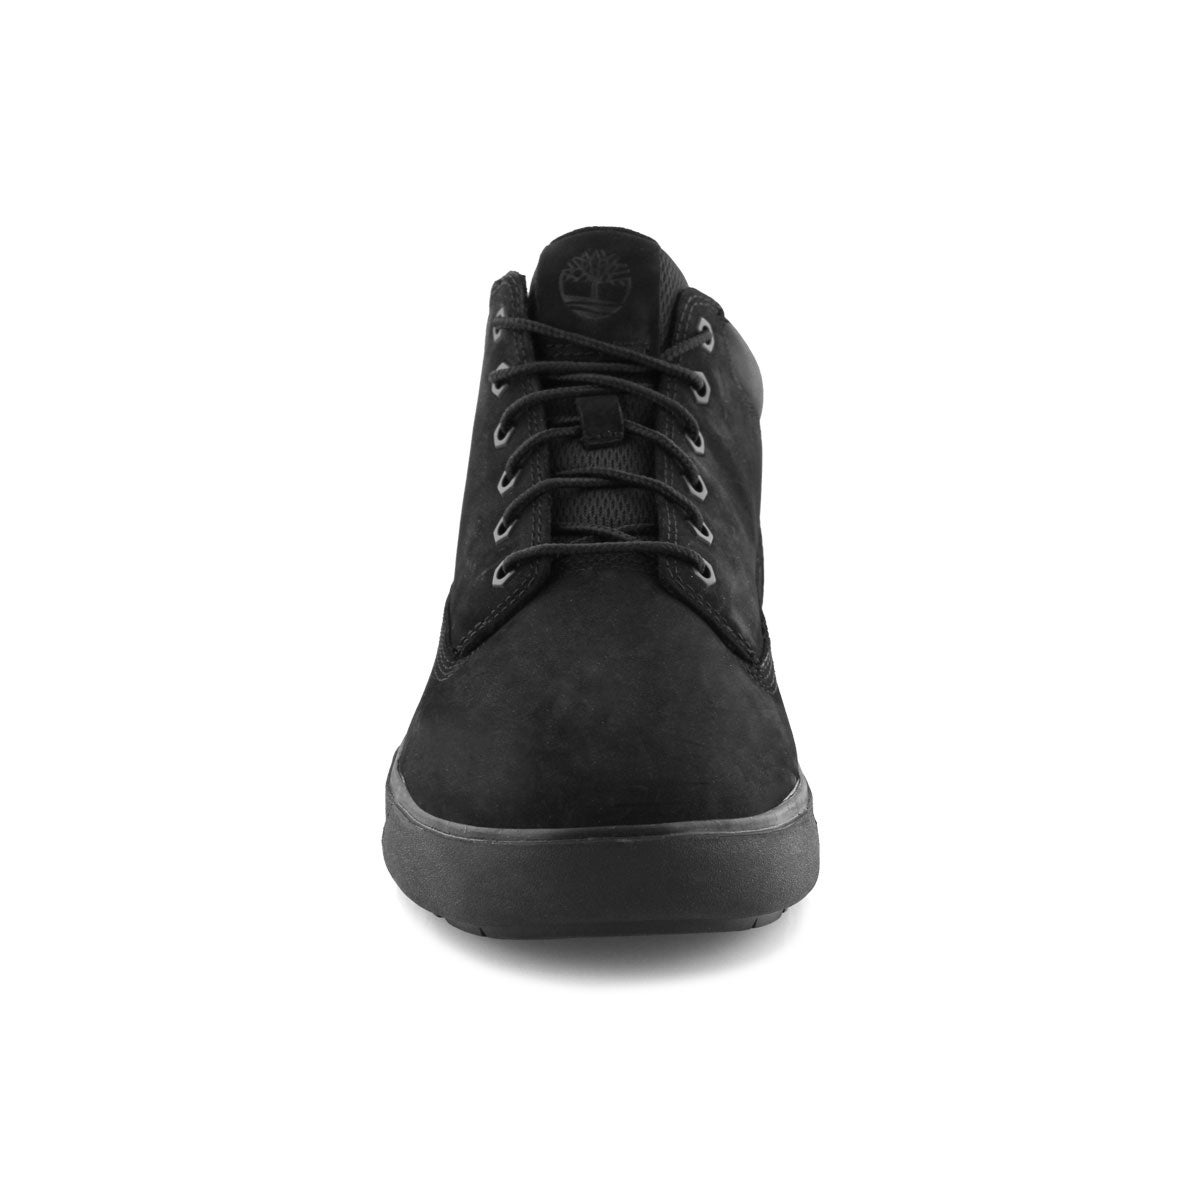 Mns Tenmile black chukka boot